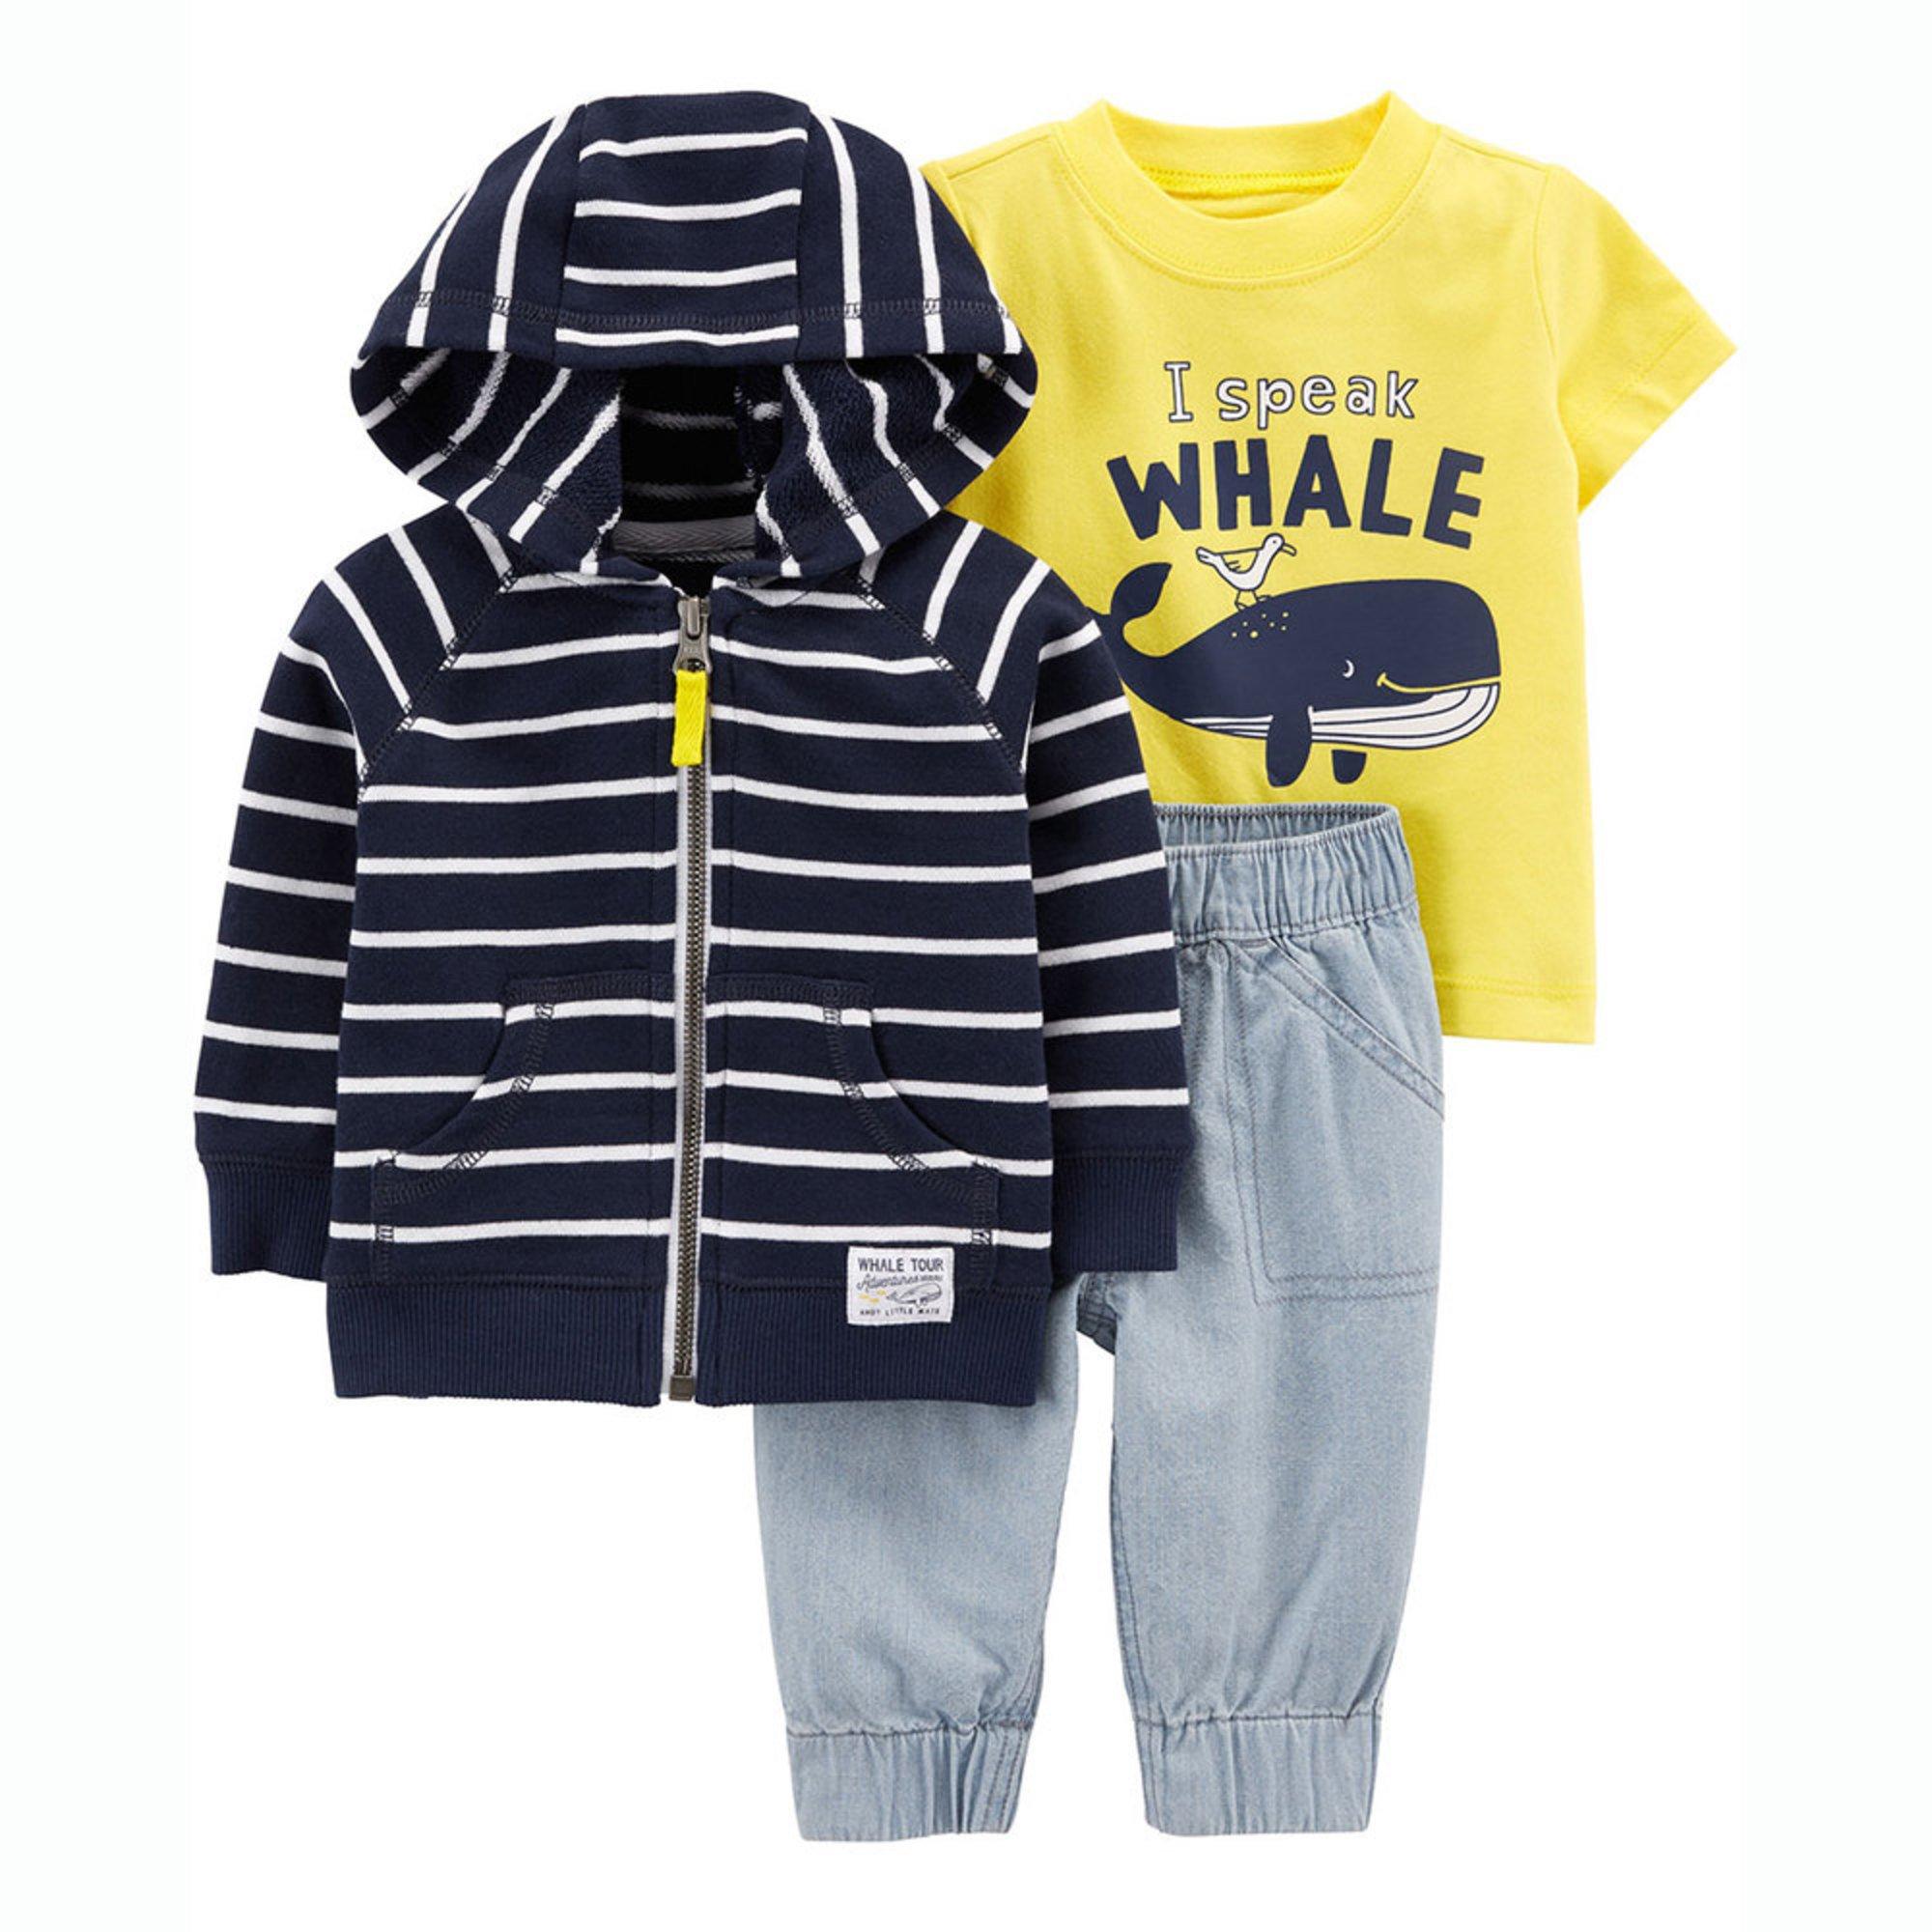 56d849ac7 Carter's Baby Boys' 3-piece Whale Cardigan Set | Baby Boys' Sets ...